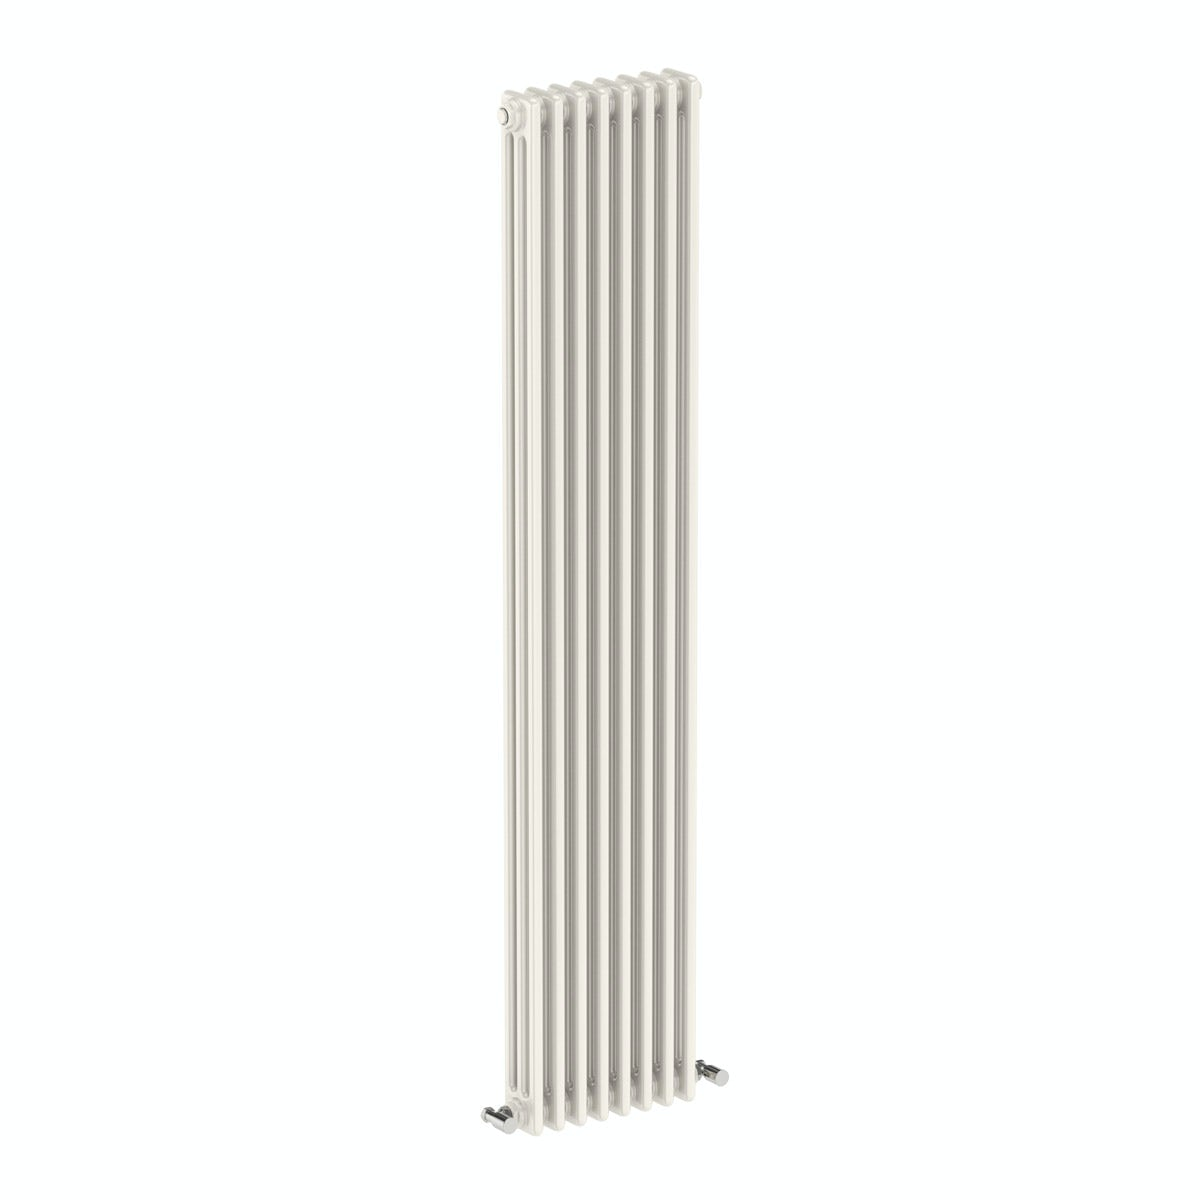 The Bath Co. Dulwich vertical white triple column radiator 1800 x 380